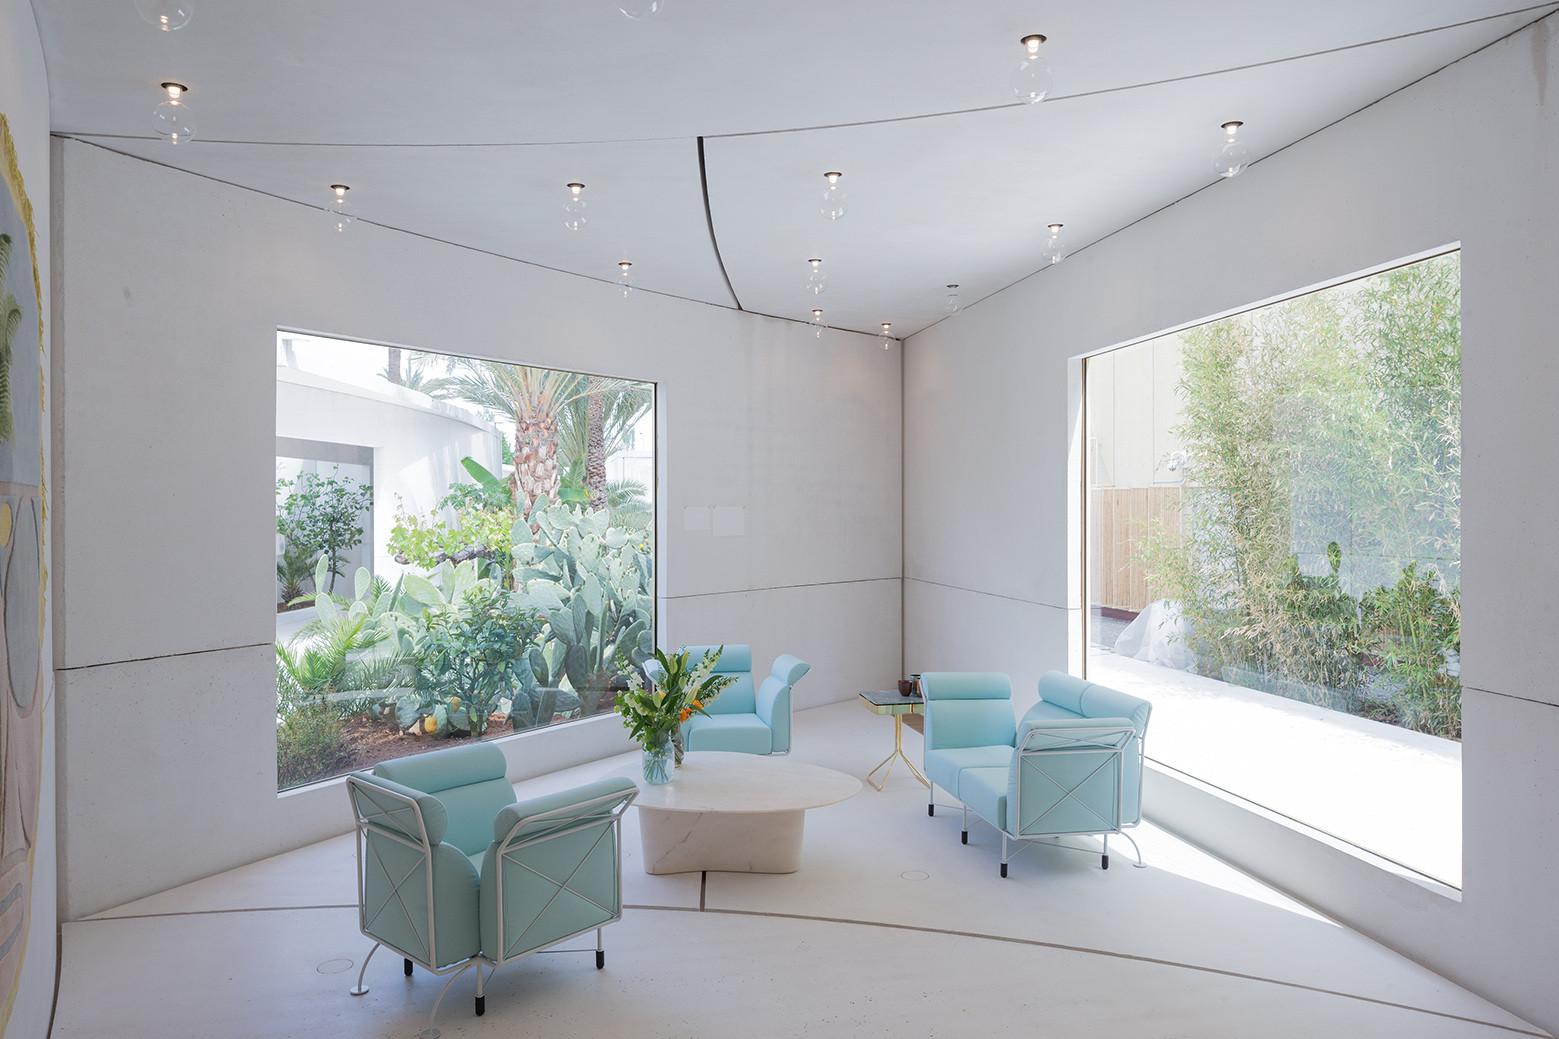 Gallery of Bahrain Pavilion – Milan Expo 2015 / Studio Anne Holtrop - 8